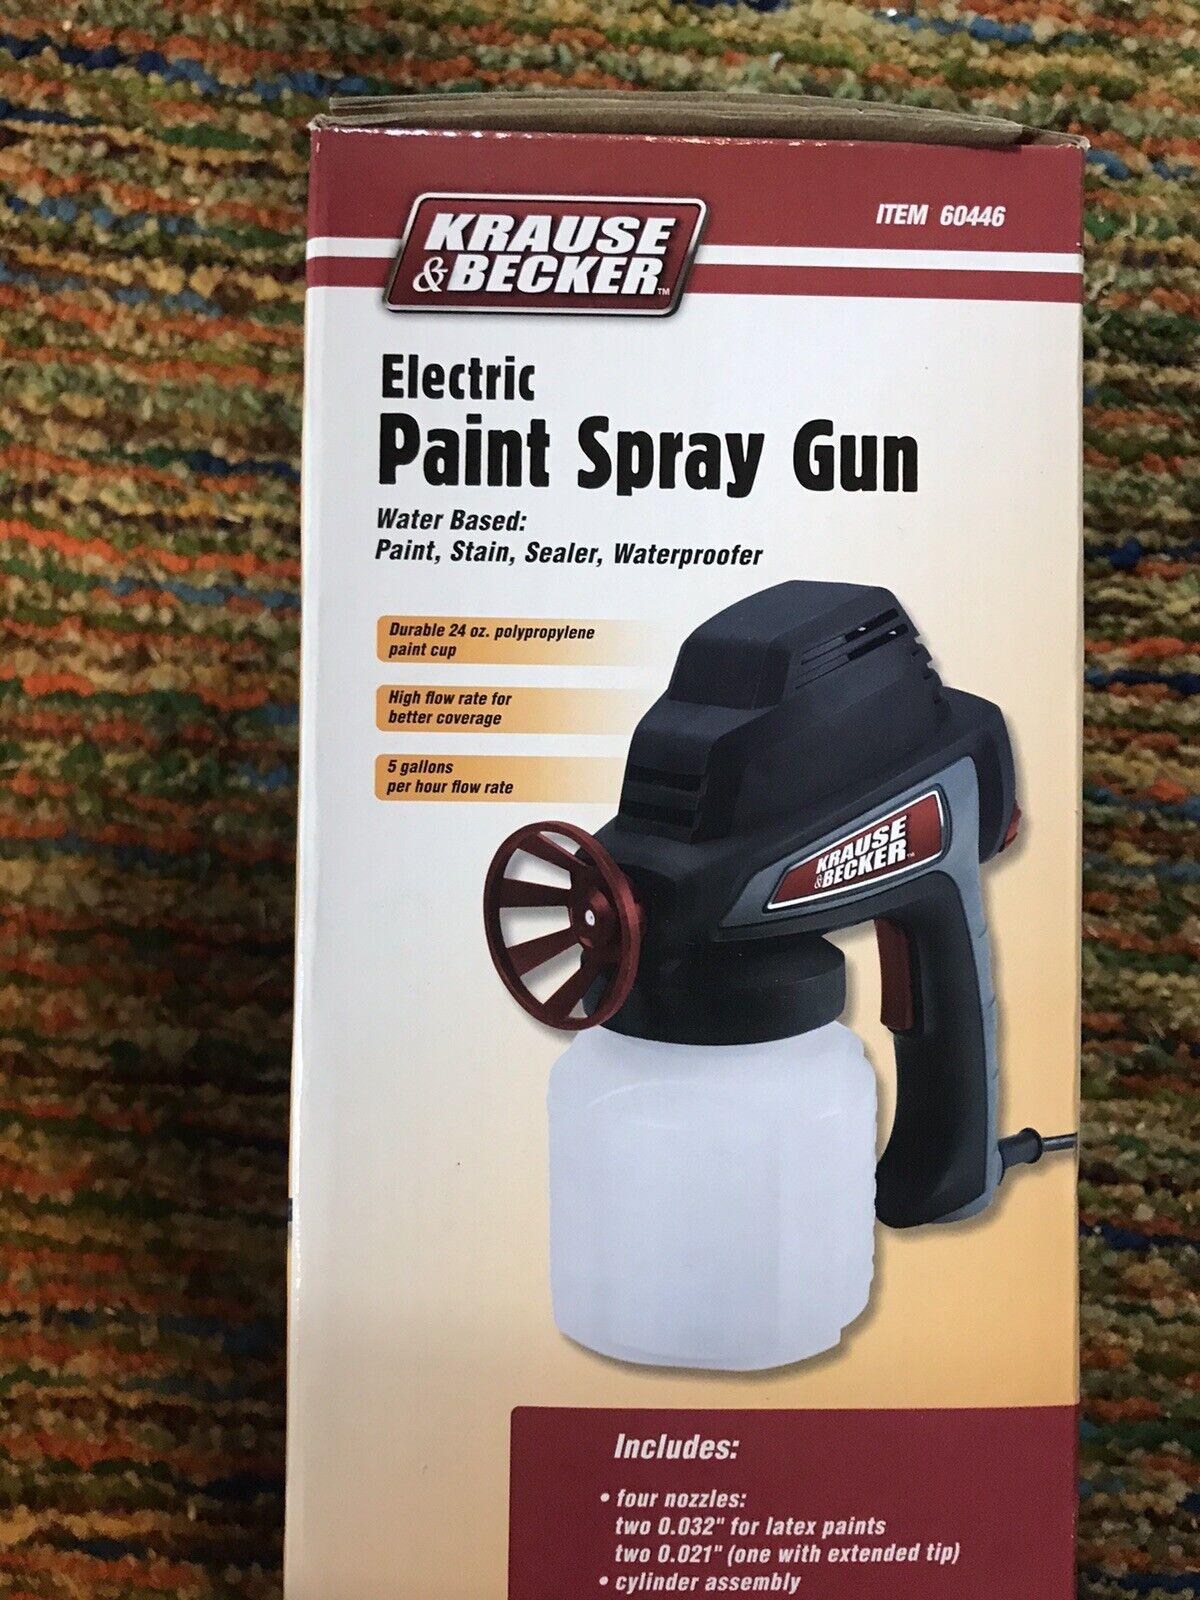 Krause And Becker Airless Sprayer : krause, becker, airless, sprayer, Krause, Becker, Electric, Paint, Spray, Durable, Polypropylene, Online